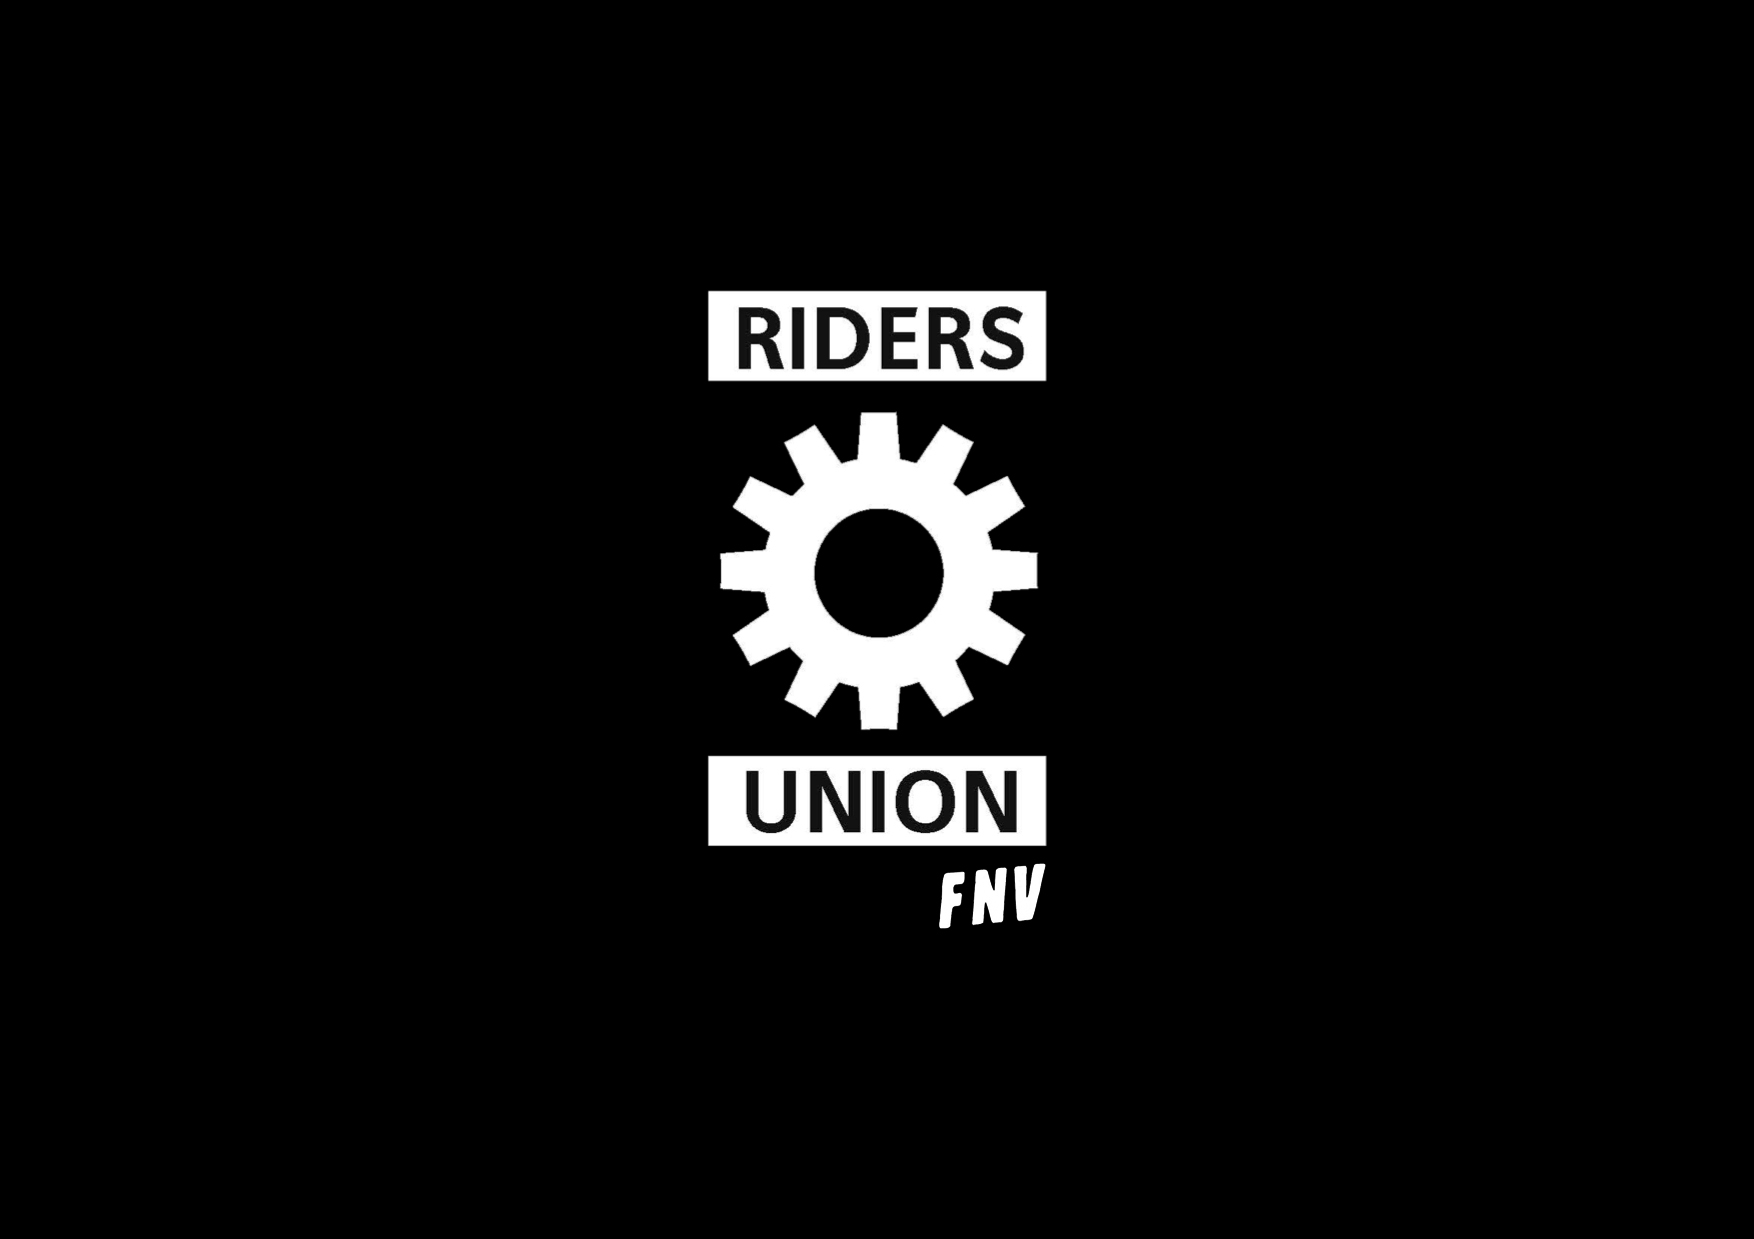 def FNV_LOGO RIDERS UNION